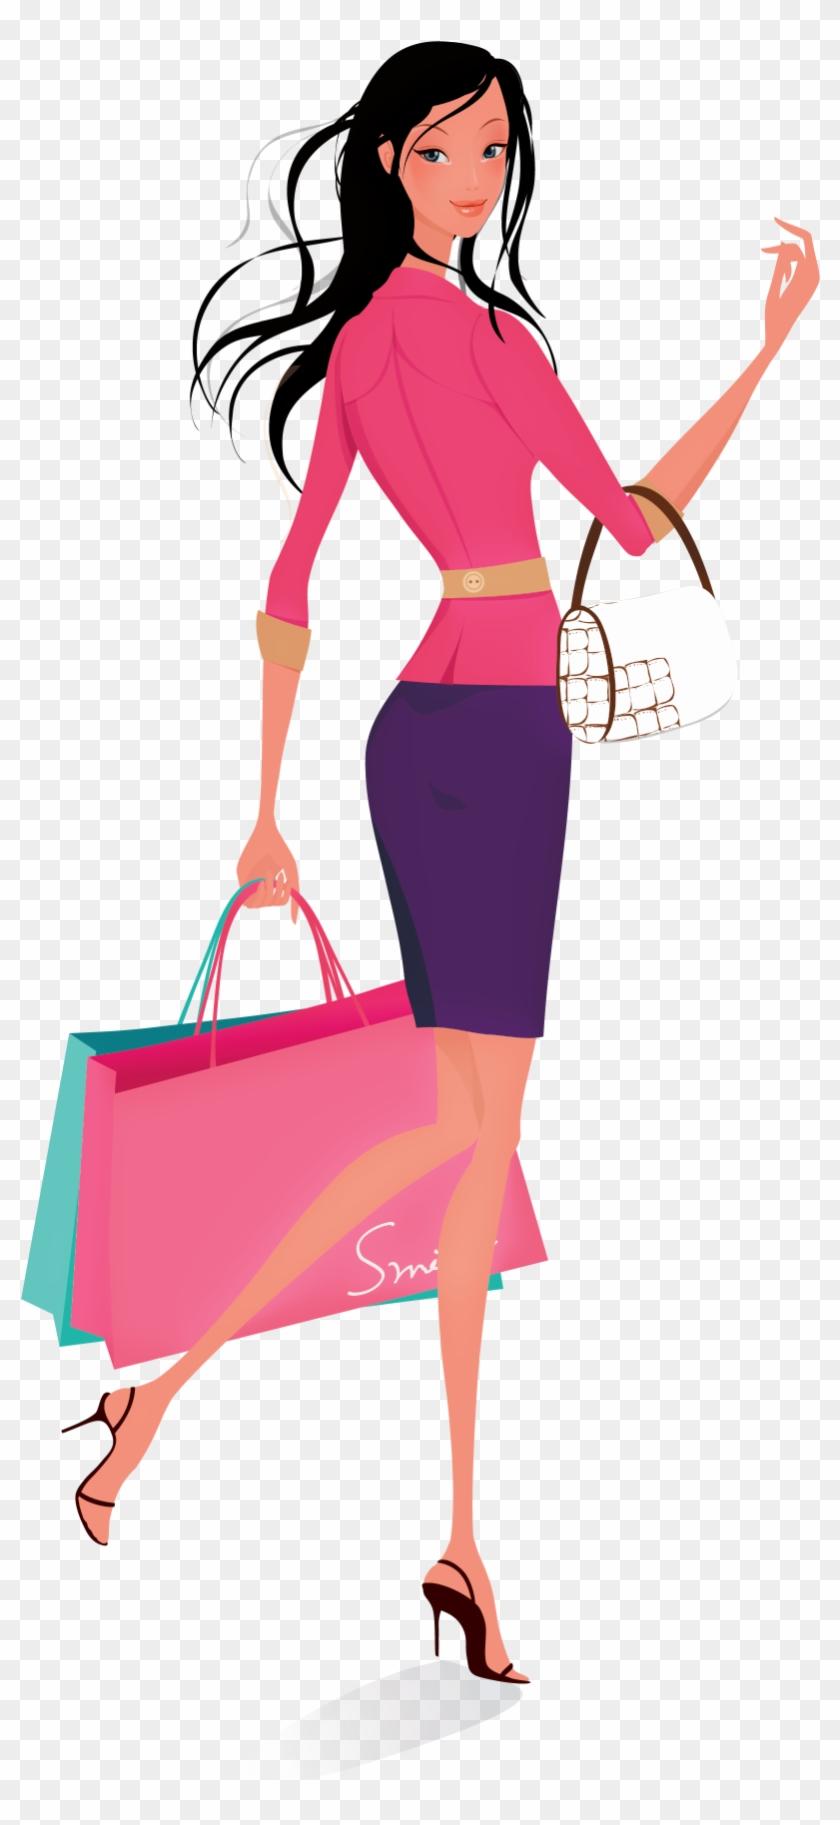 840x1825 Shopping Women Vector